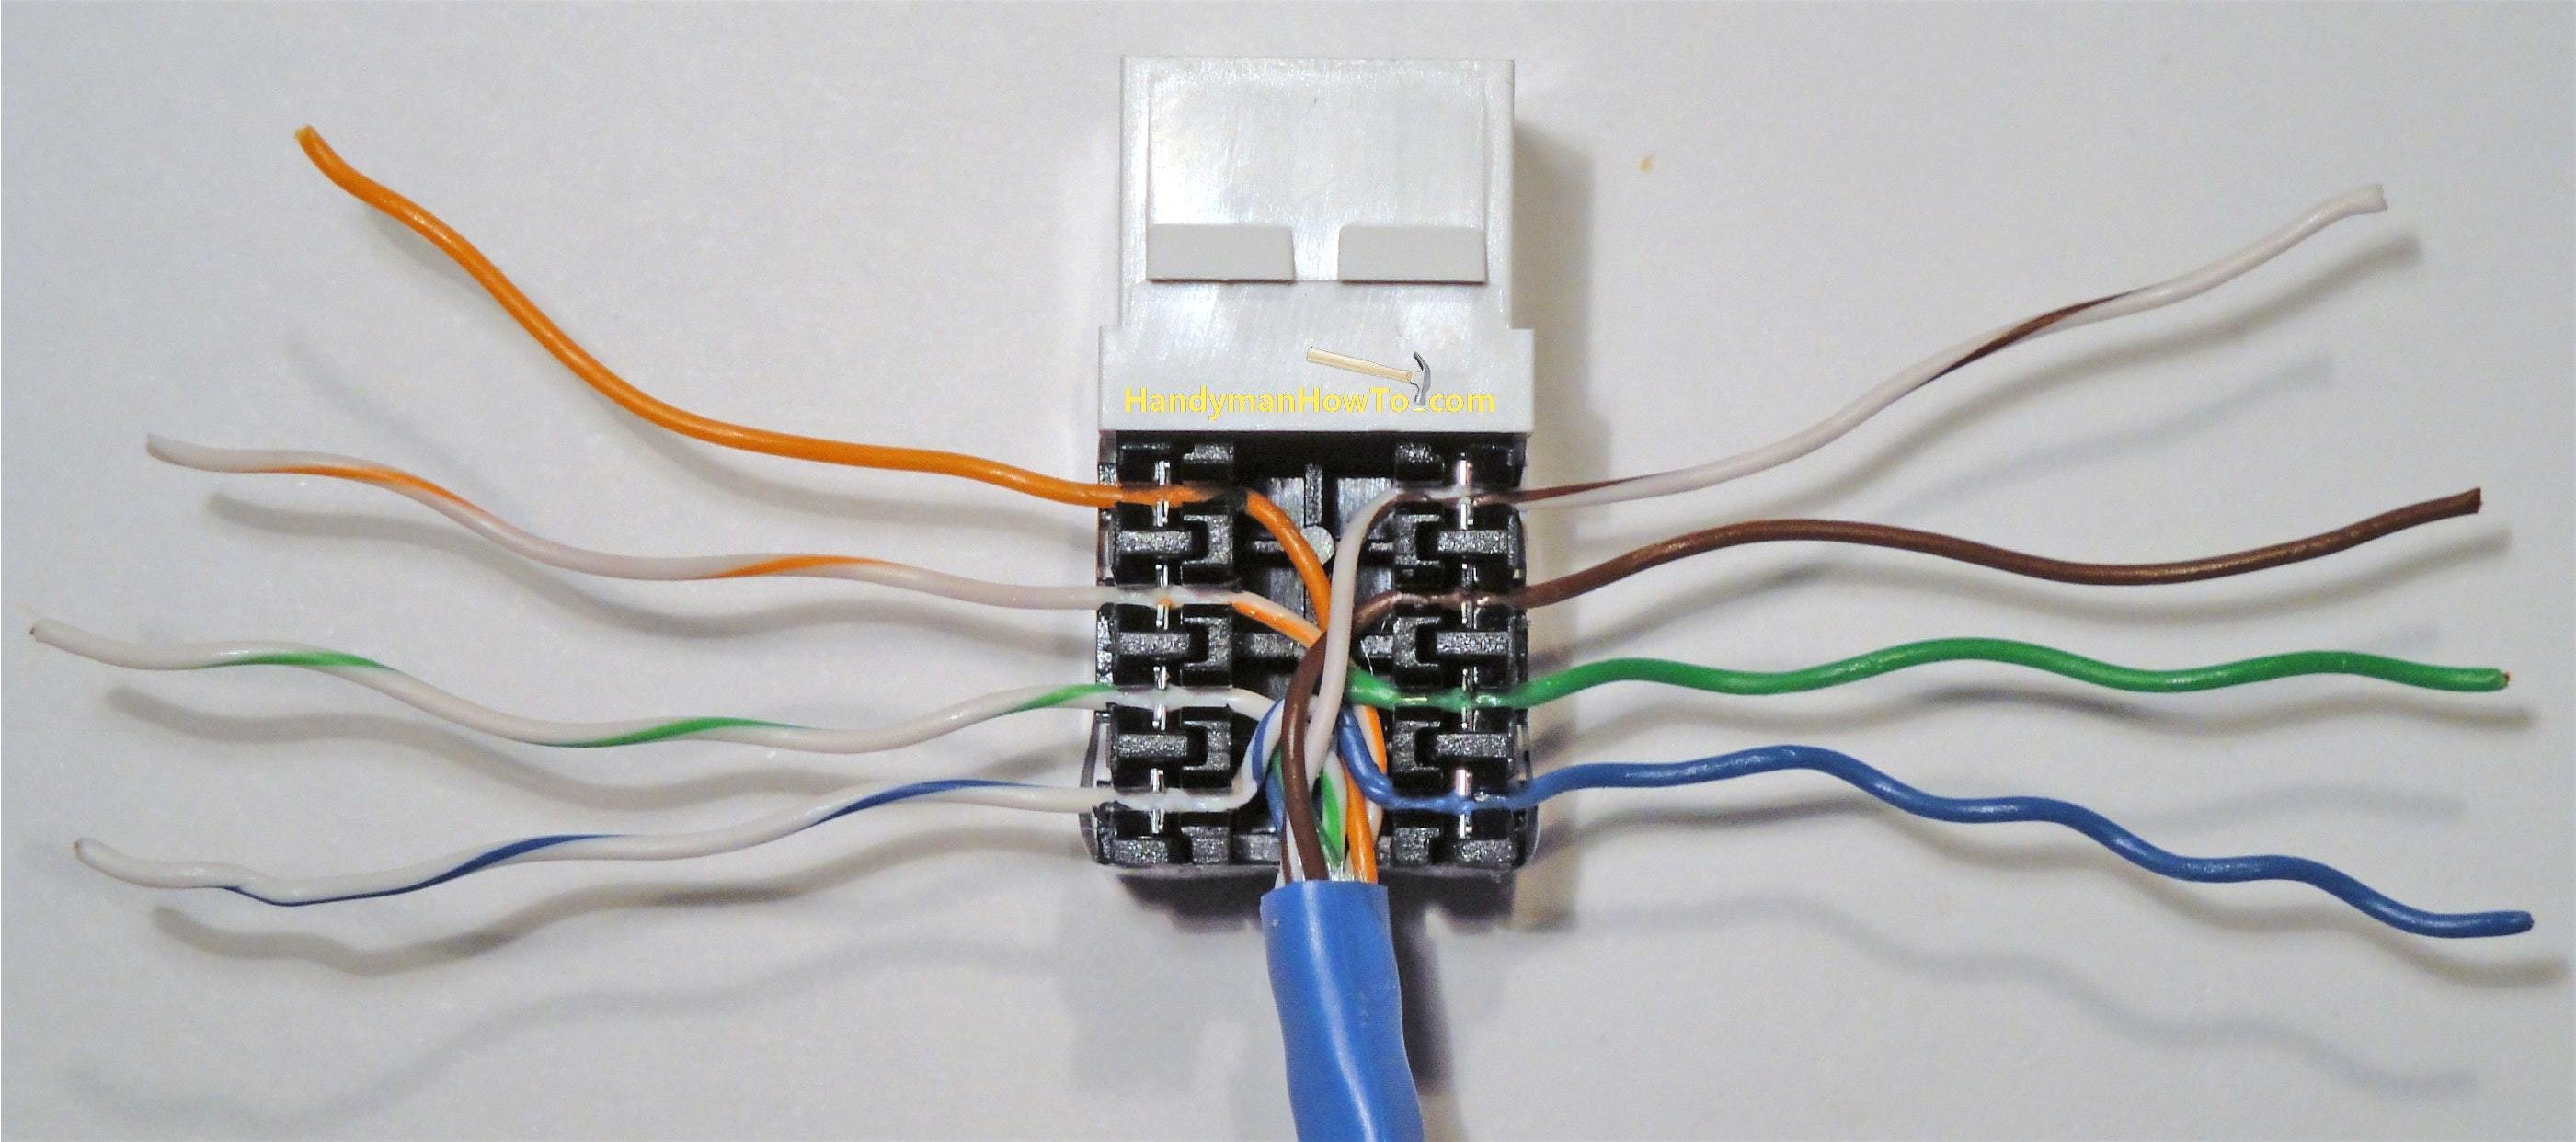 master socket wiring diagram on cat 5 wiring diagram for wall plate rh metroagua co